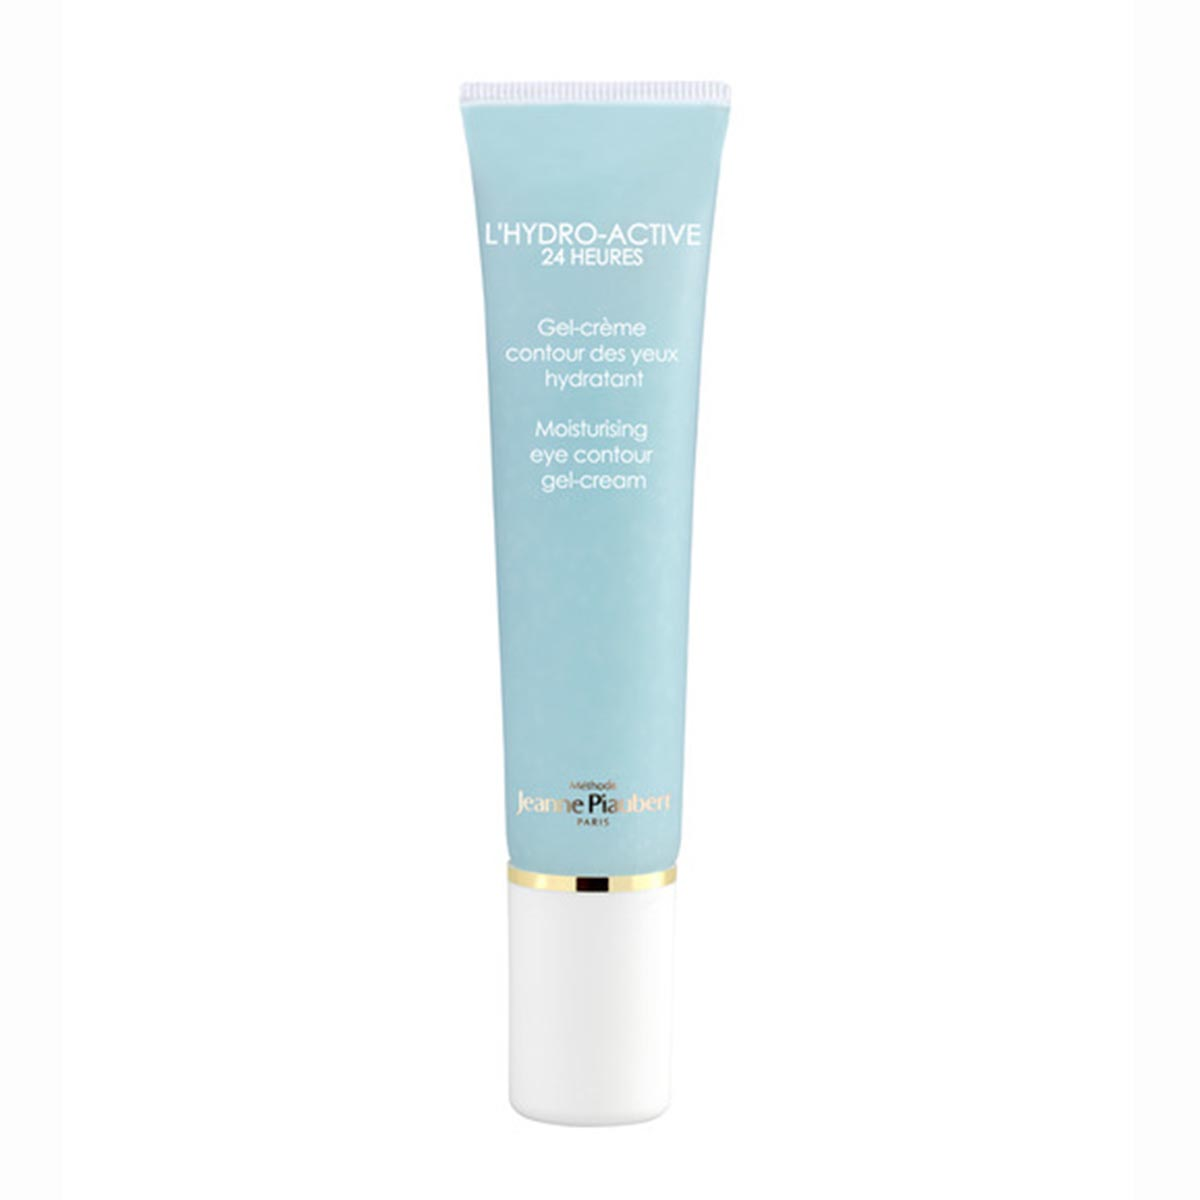 Jeanne piaubert l hydro active 24h moisrutizing eye contour gel cream 15ml